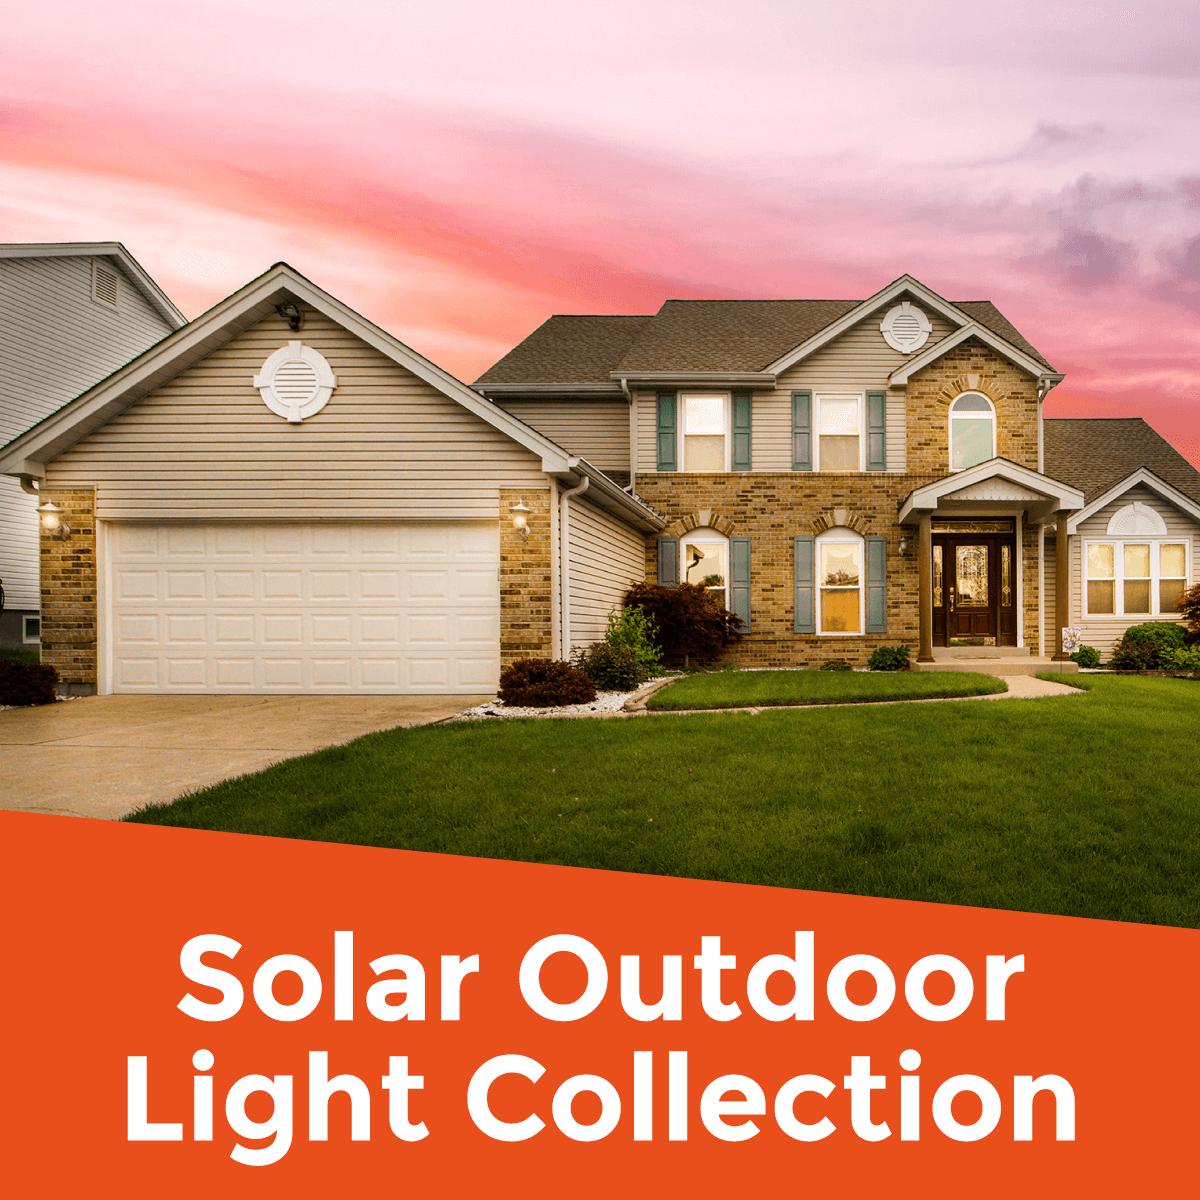 Solar Outdoor Light Collection